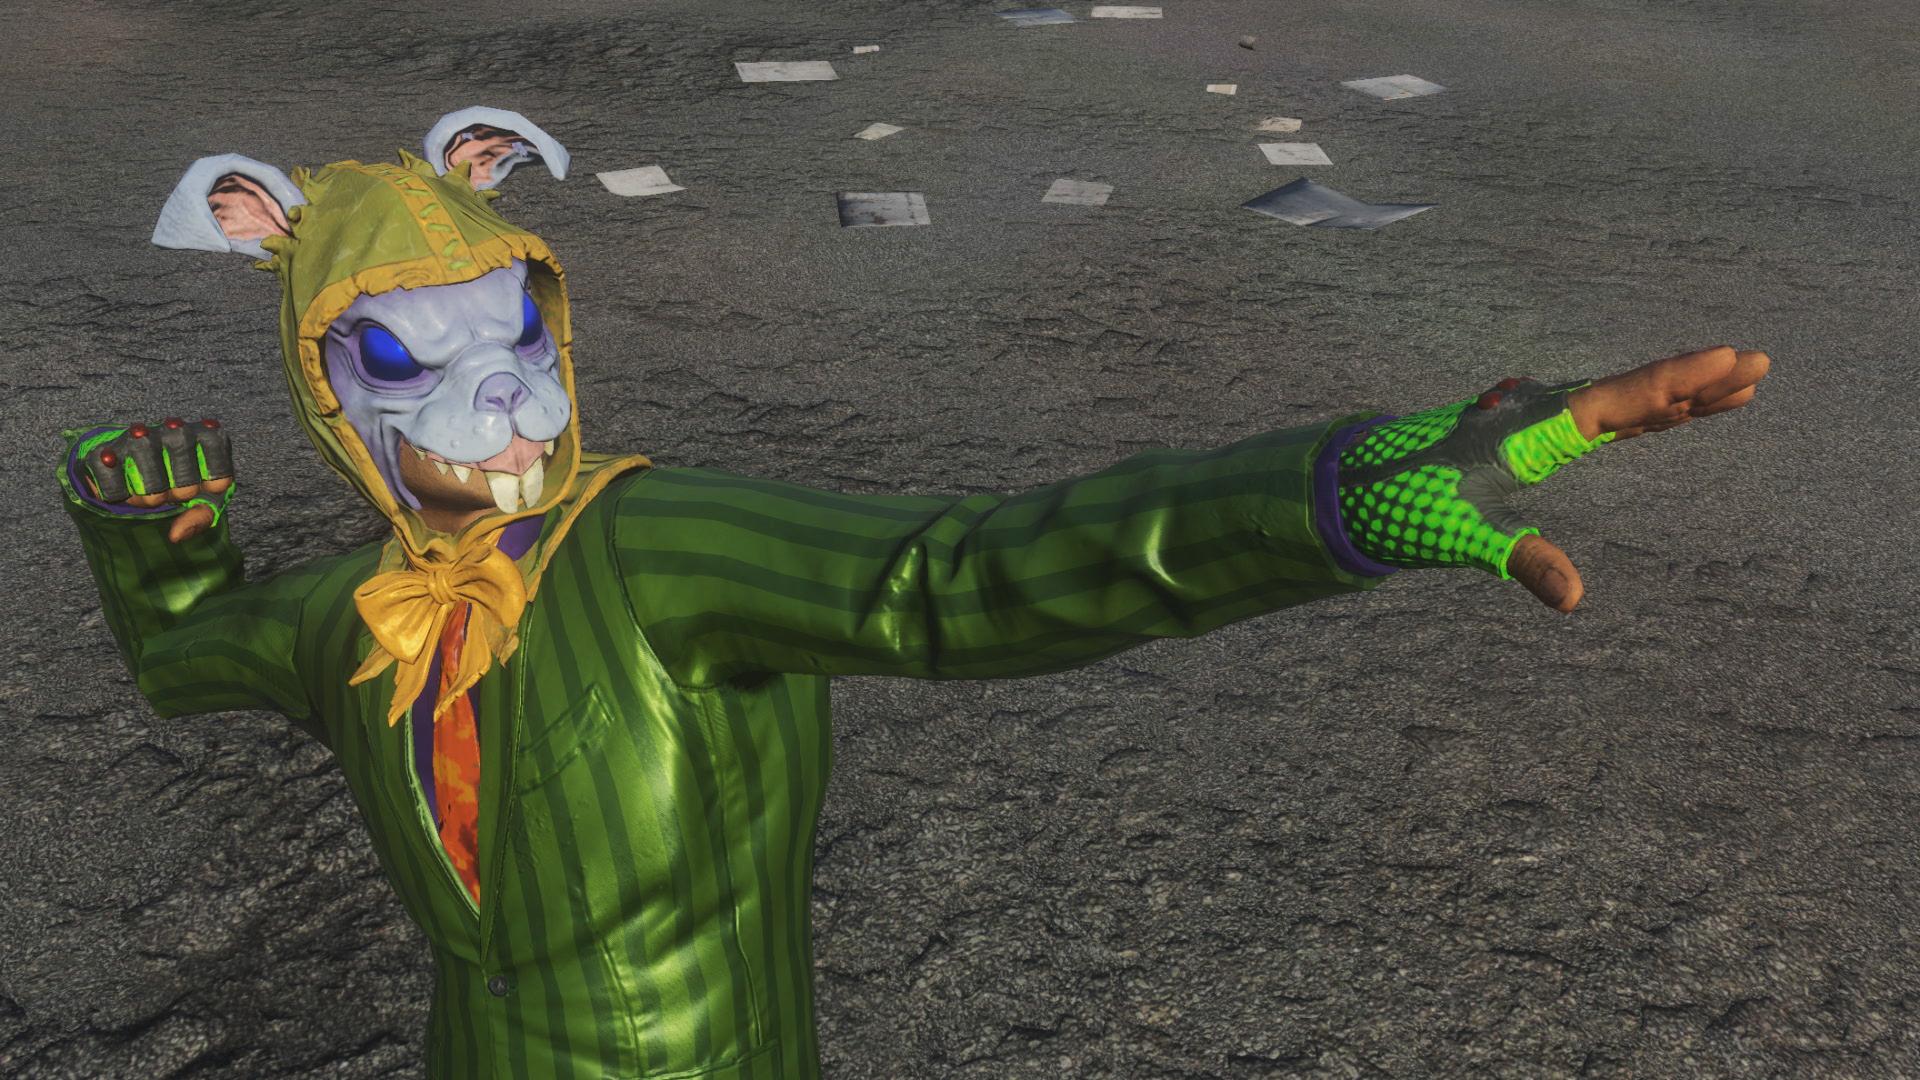 Play a Match, Win a Mask!